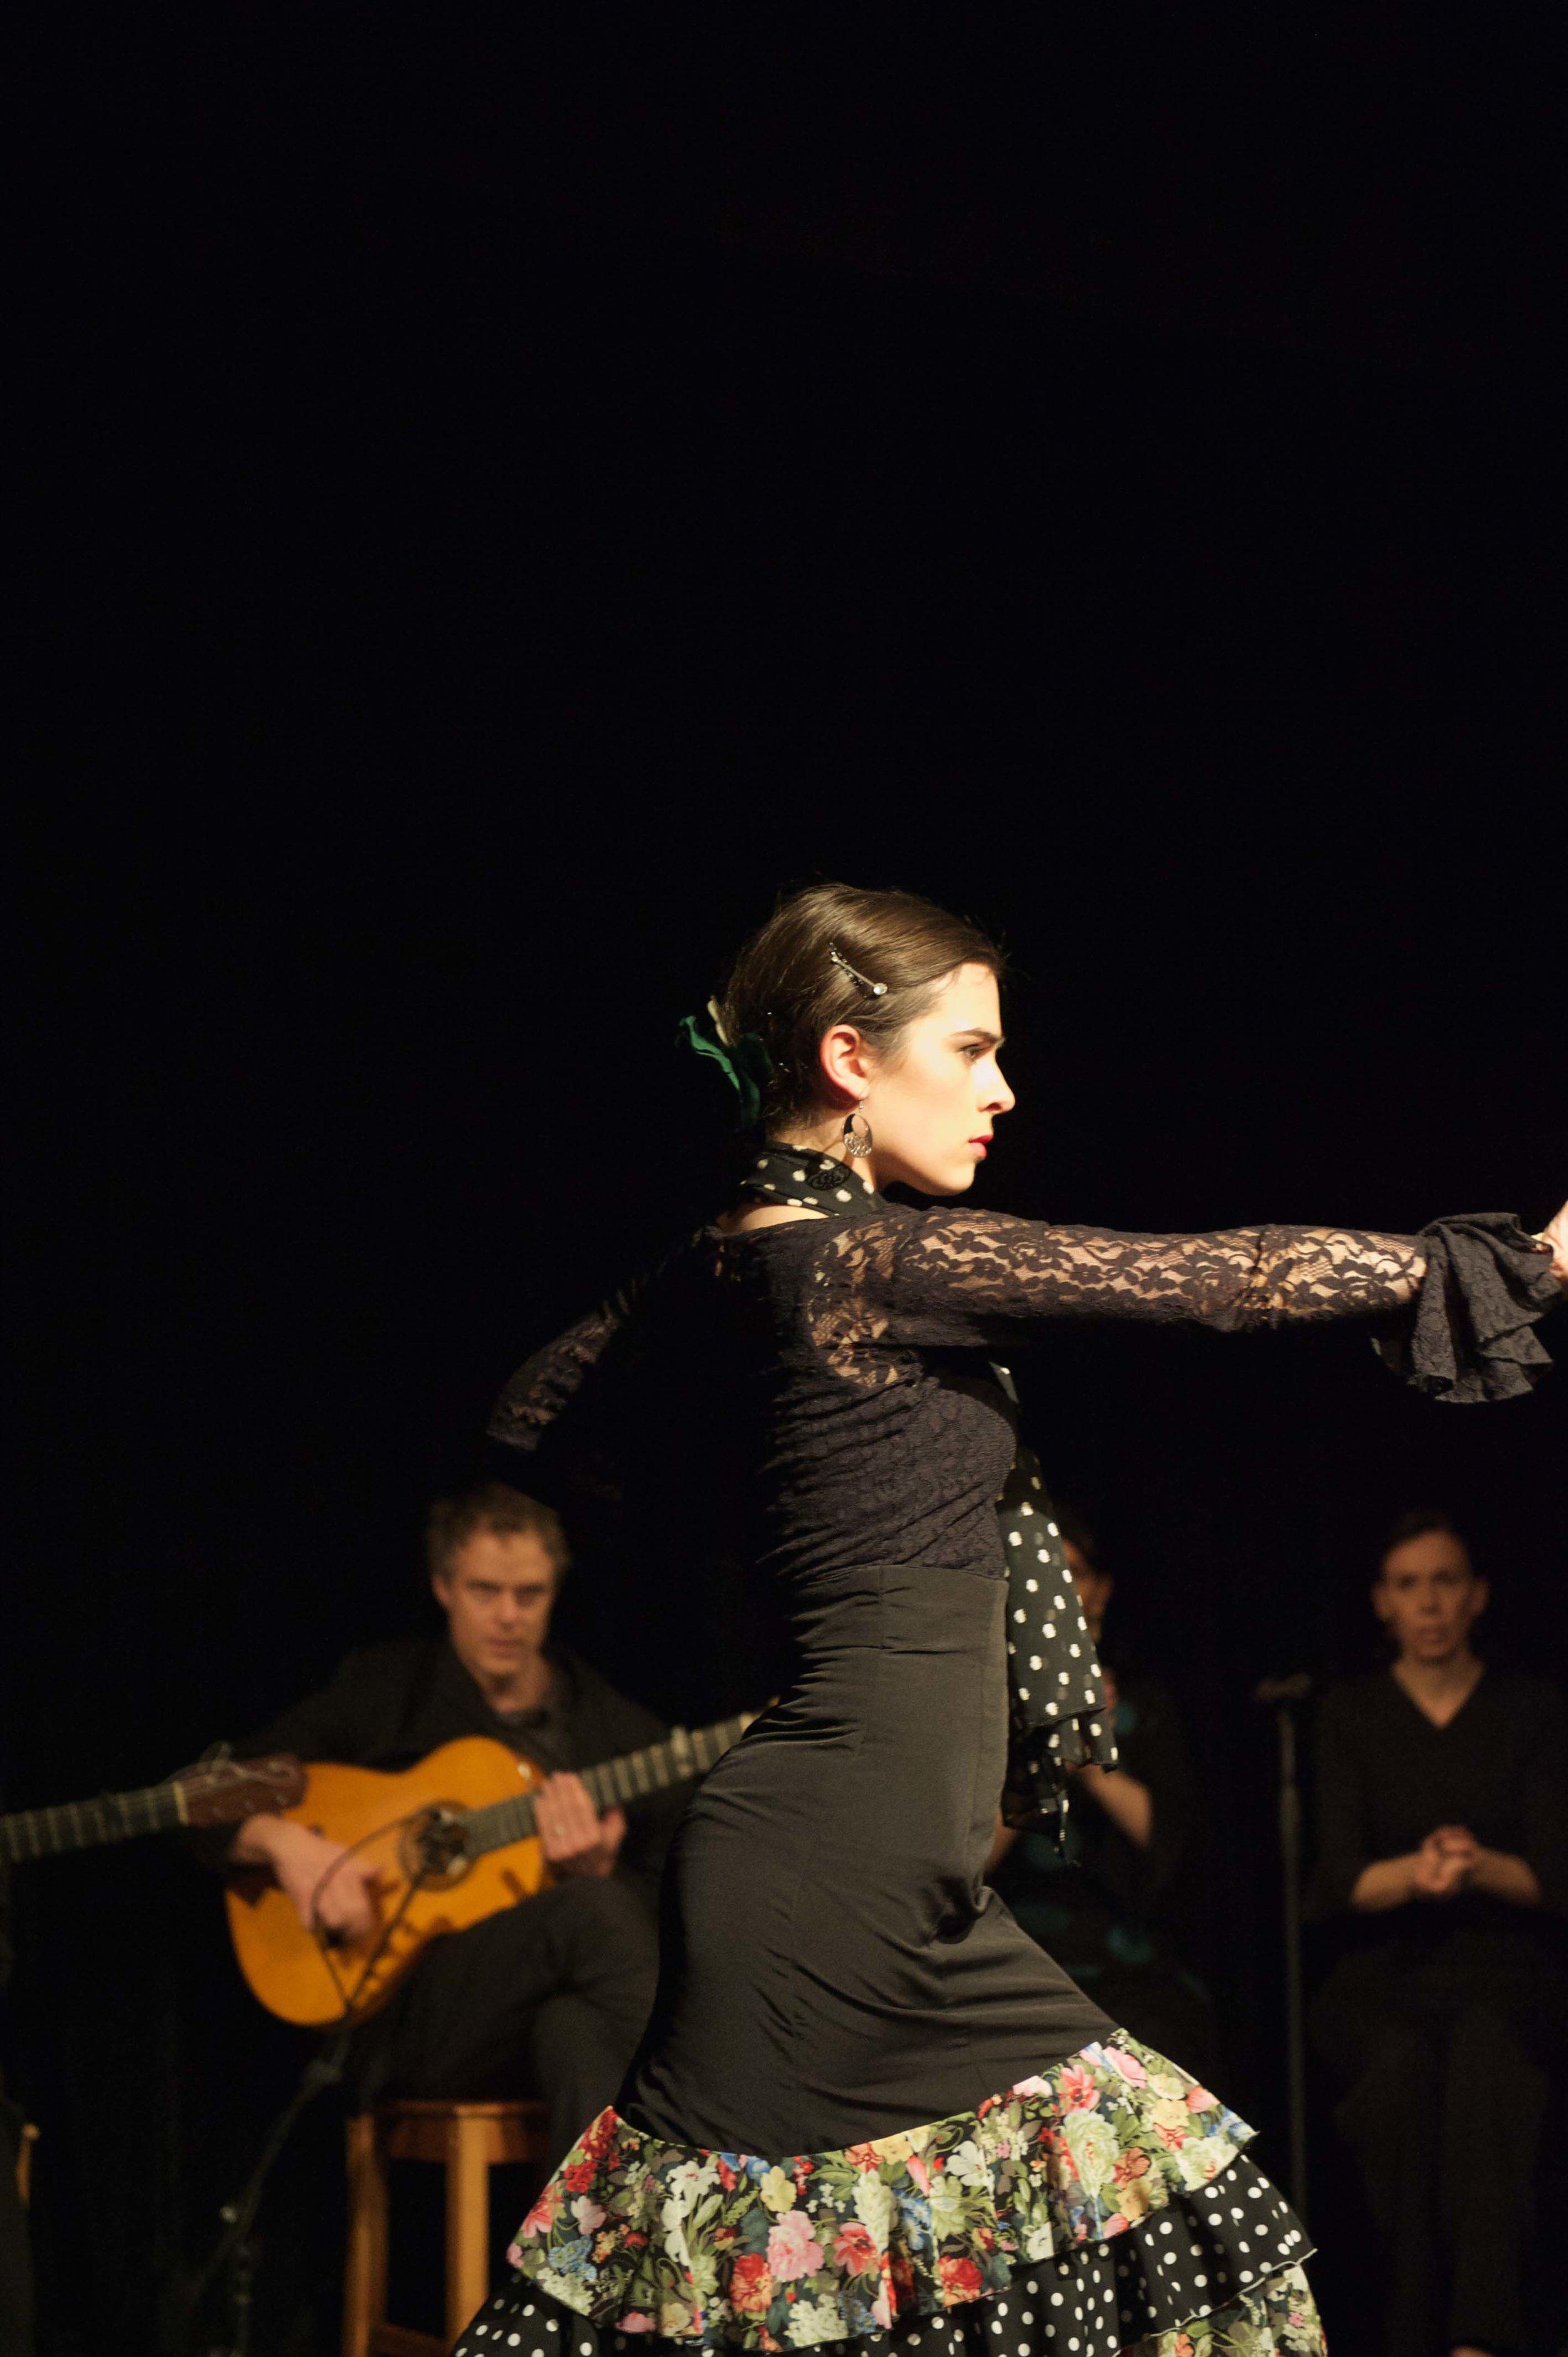 2016-07-31studio flamenco August 2016_150 of 207_1.jpg